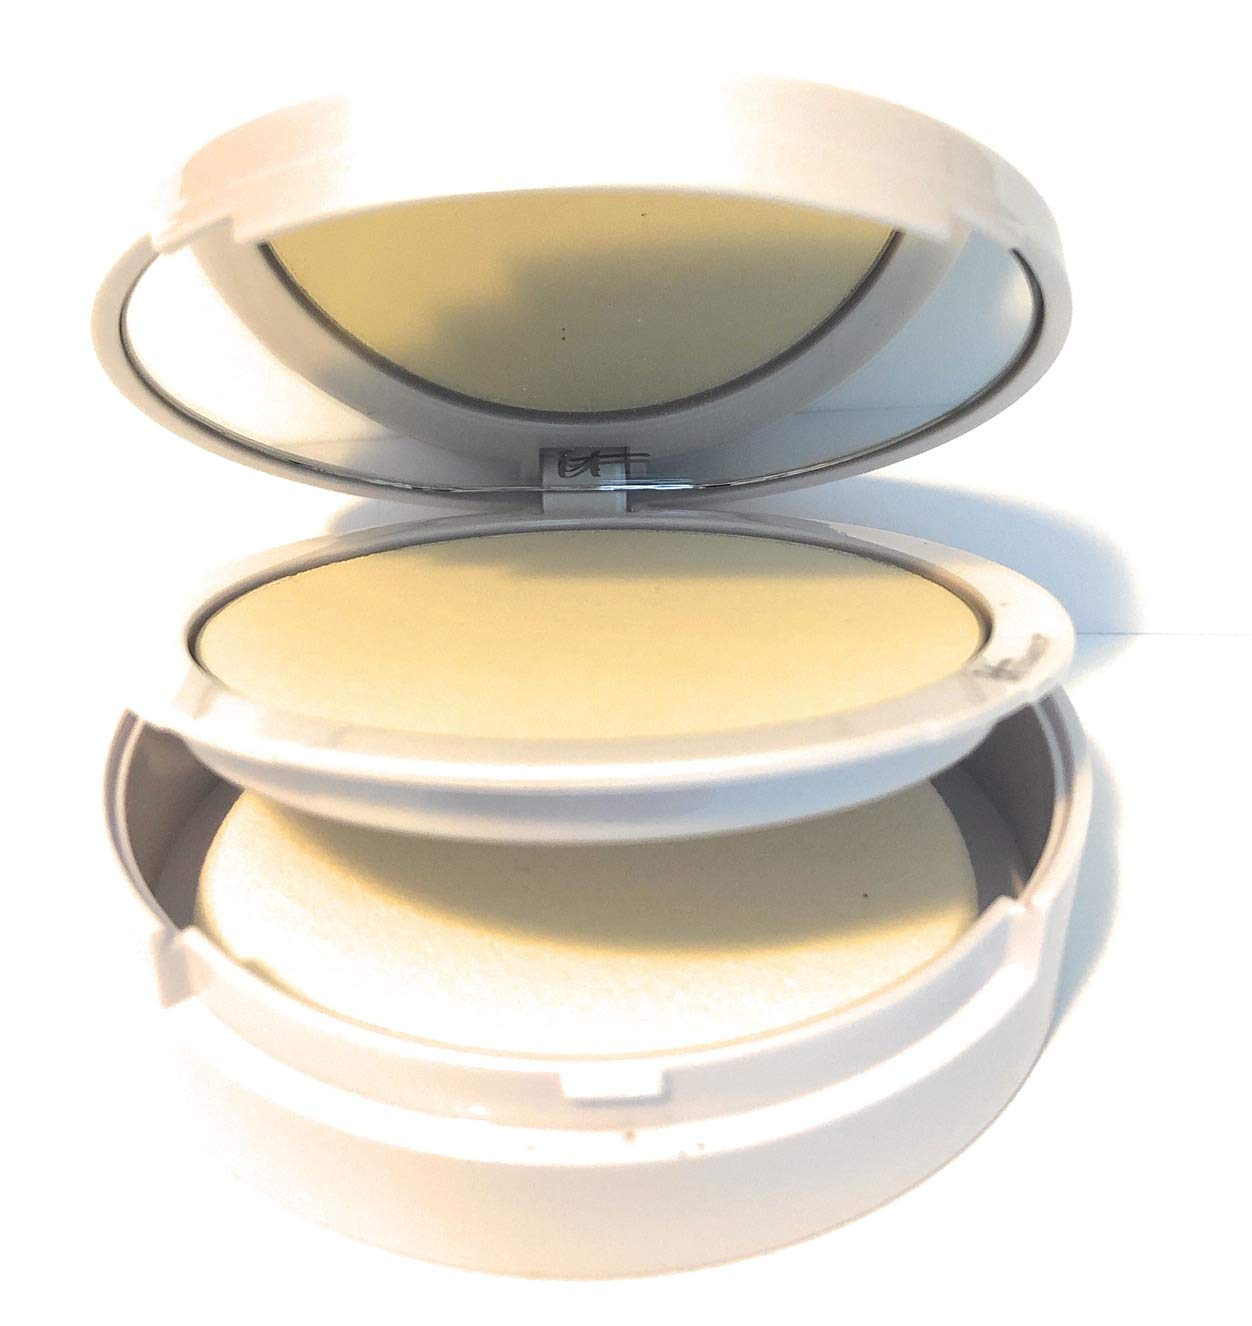 It Cosmetics Bye Bye Pores Illumination Poreless Finish Airbrush Pressed Powder in Radiant Transulcent 0.31 oz by It Cosmetics